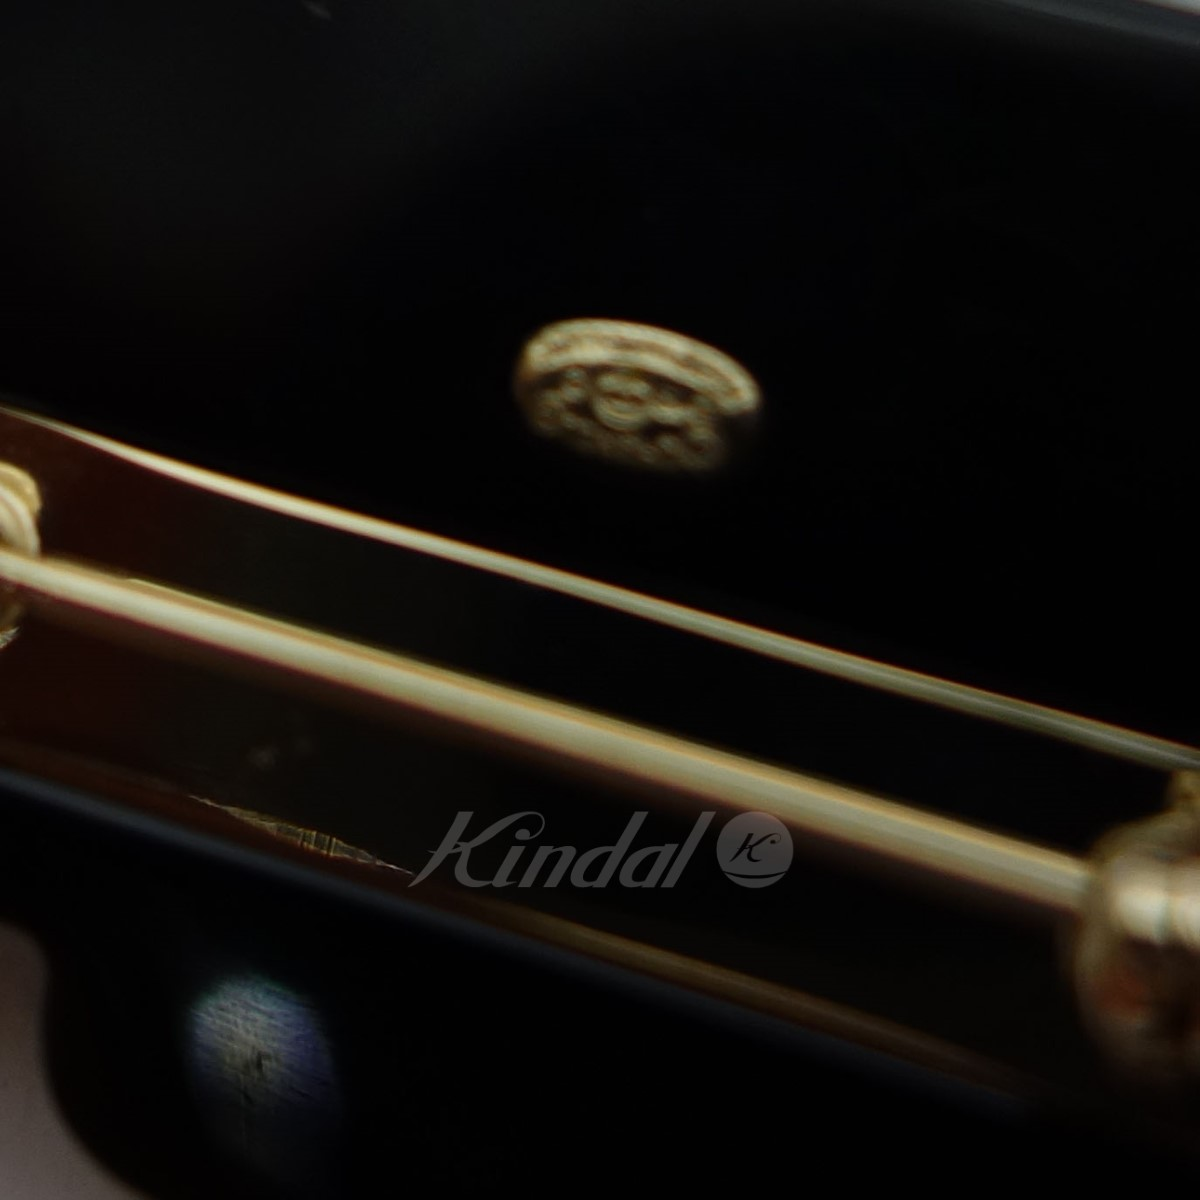 CHANEL カメラブローチ ブラック170420シャネルPXuZki